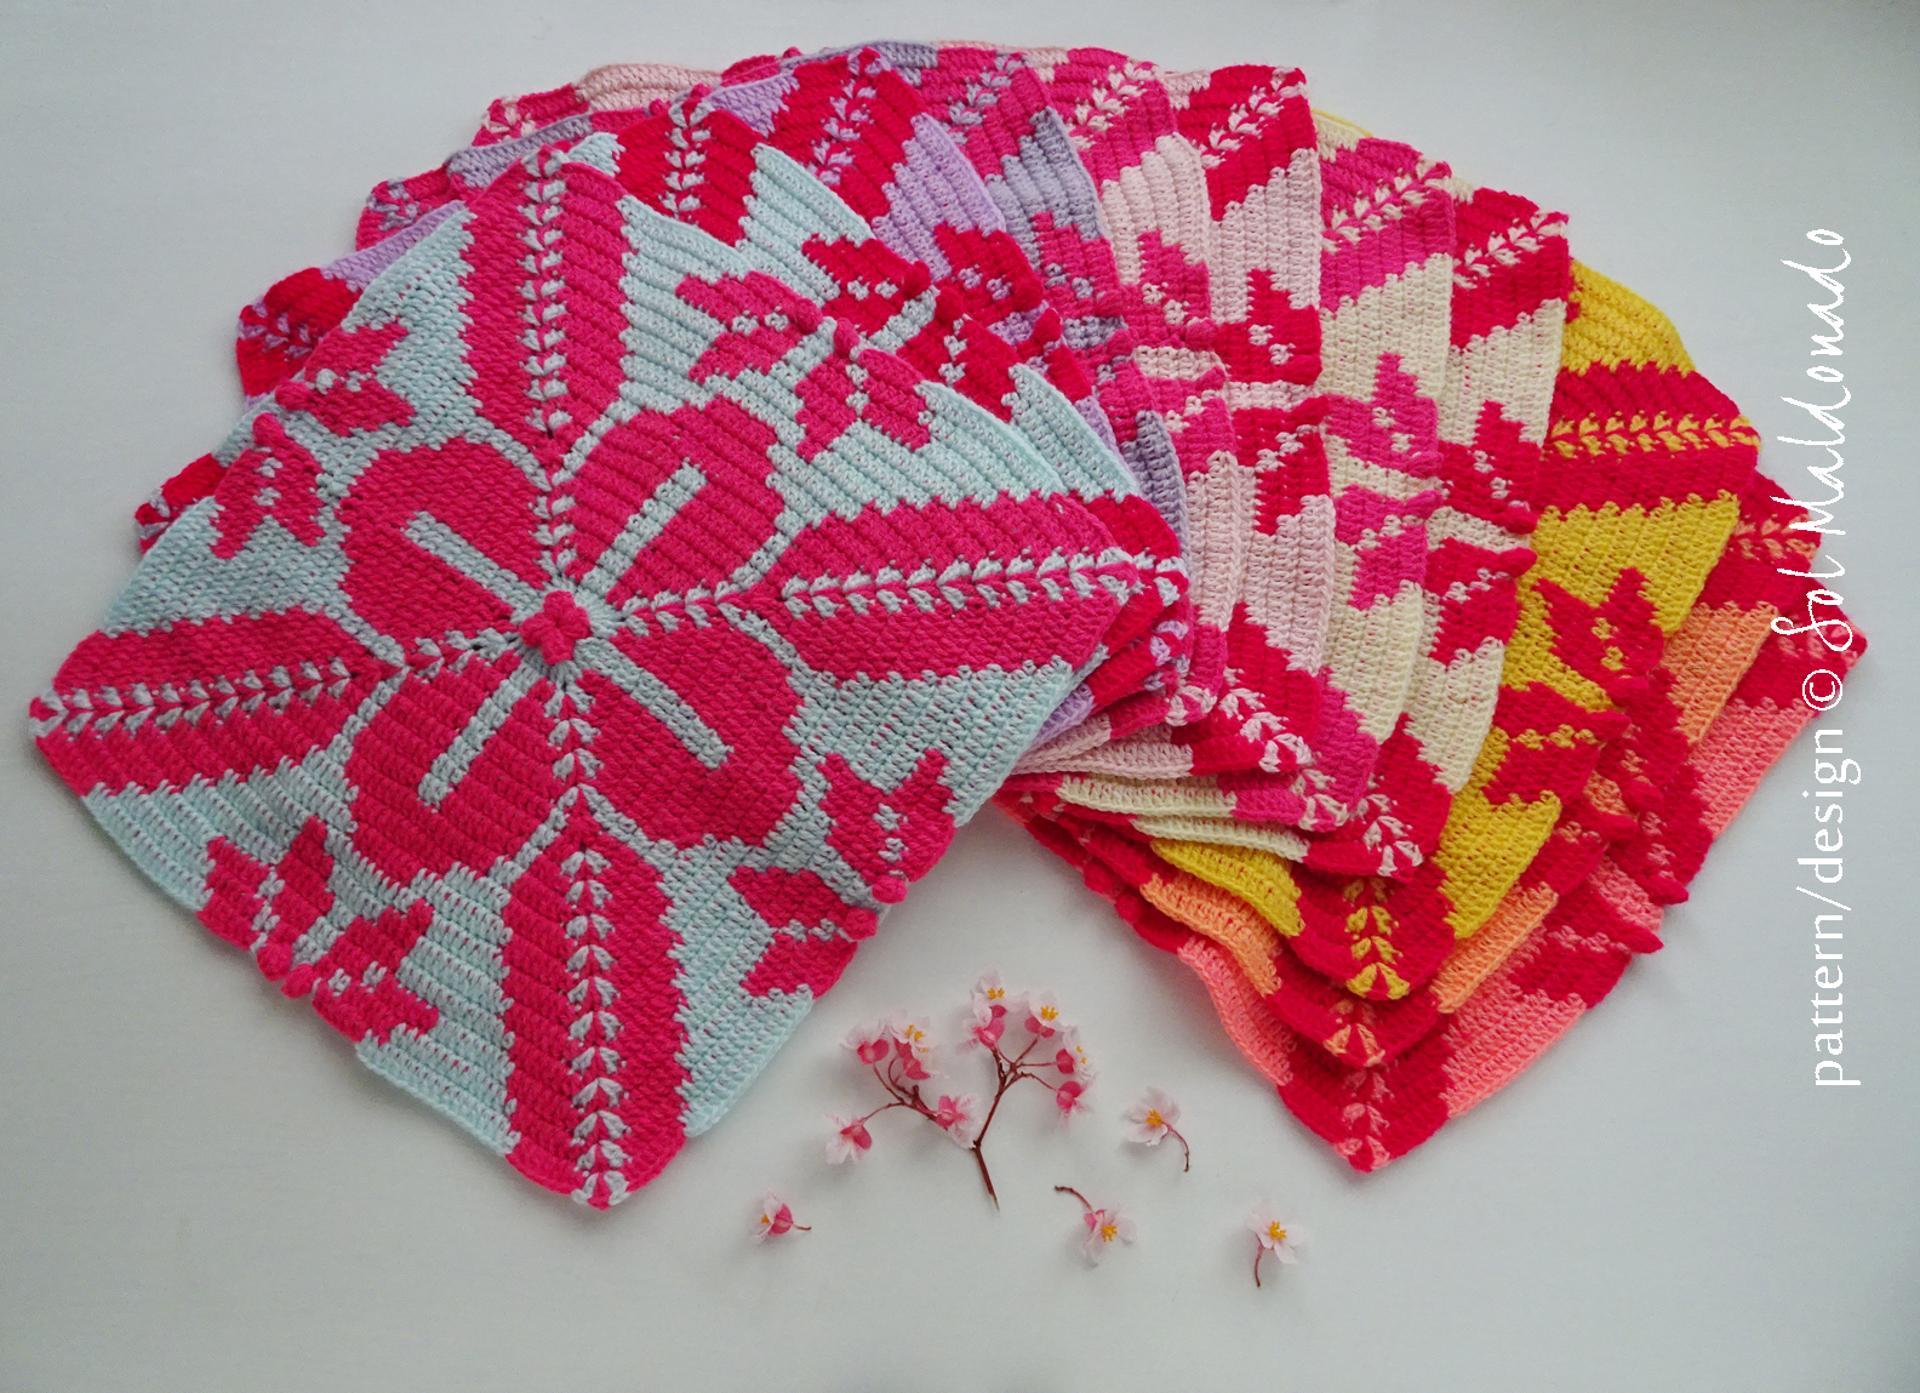 aloha tapestry crochet pattern